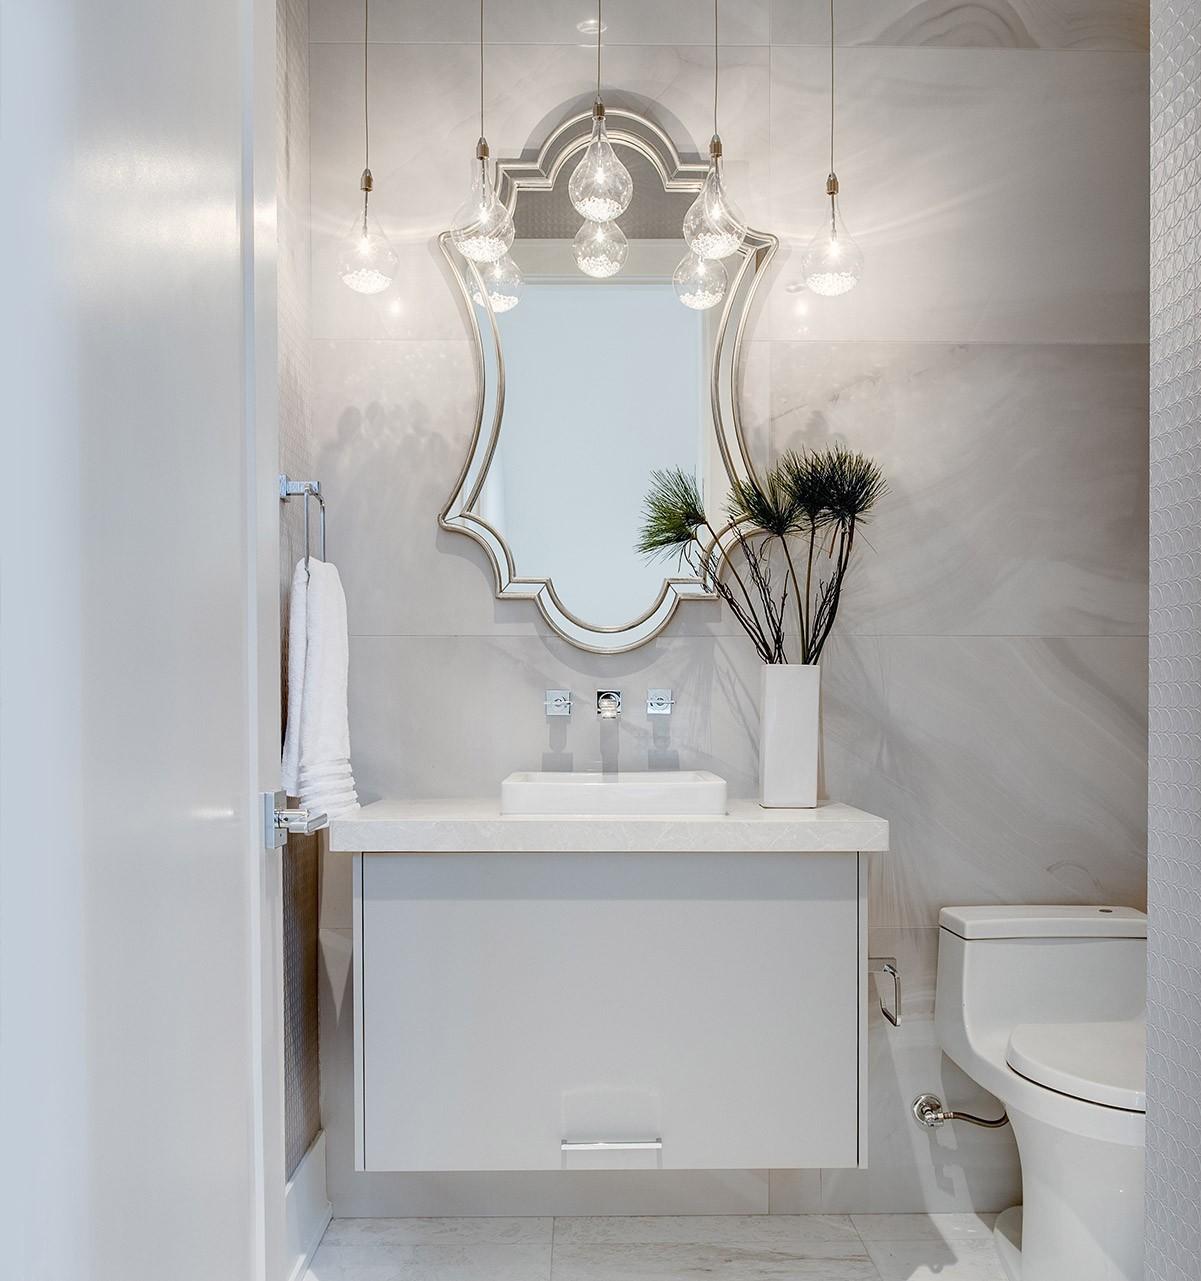 Kitchen Cabinets Surrey Bc: Modern Bathroom Cabinets Canada